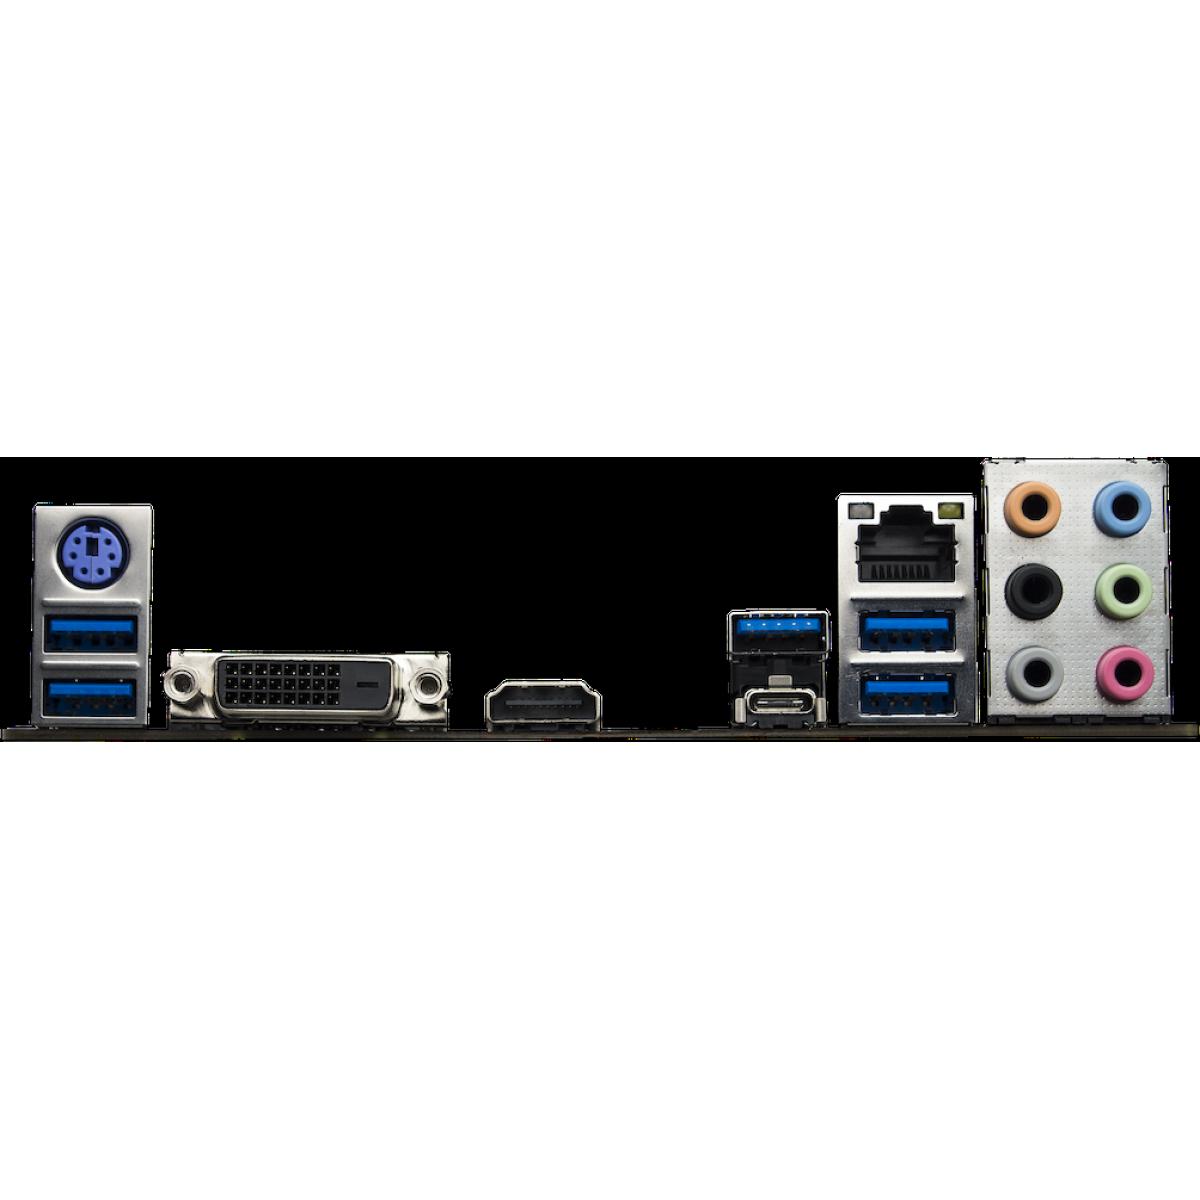 Placa Mãe Biostar Racing X470GTA, Chipset X470, AMD AM4, ATX, DDR4 - Open Box